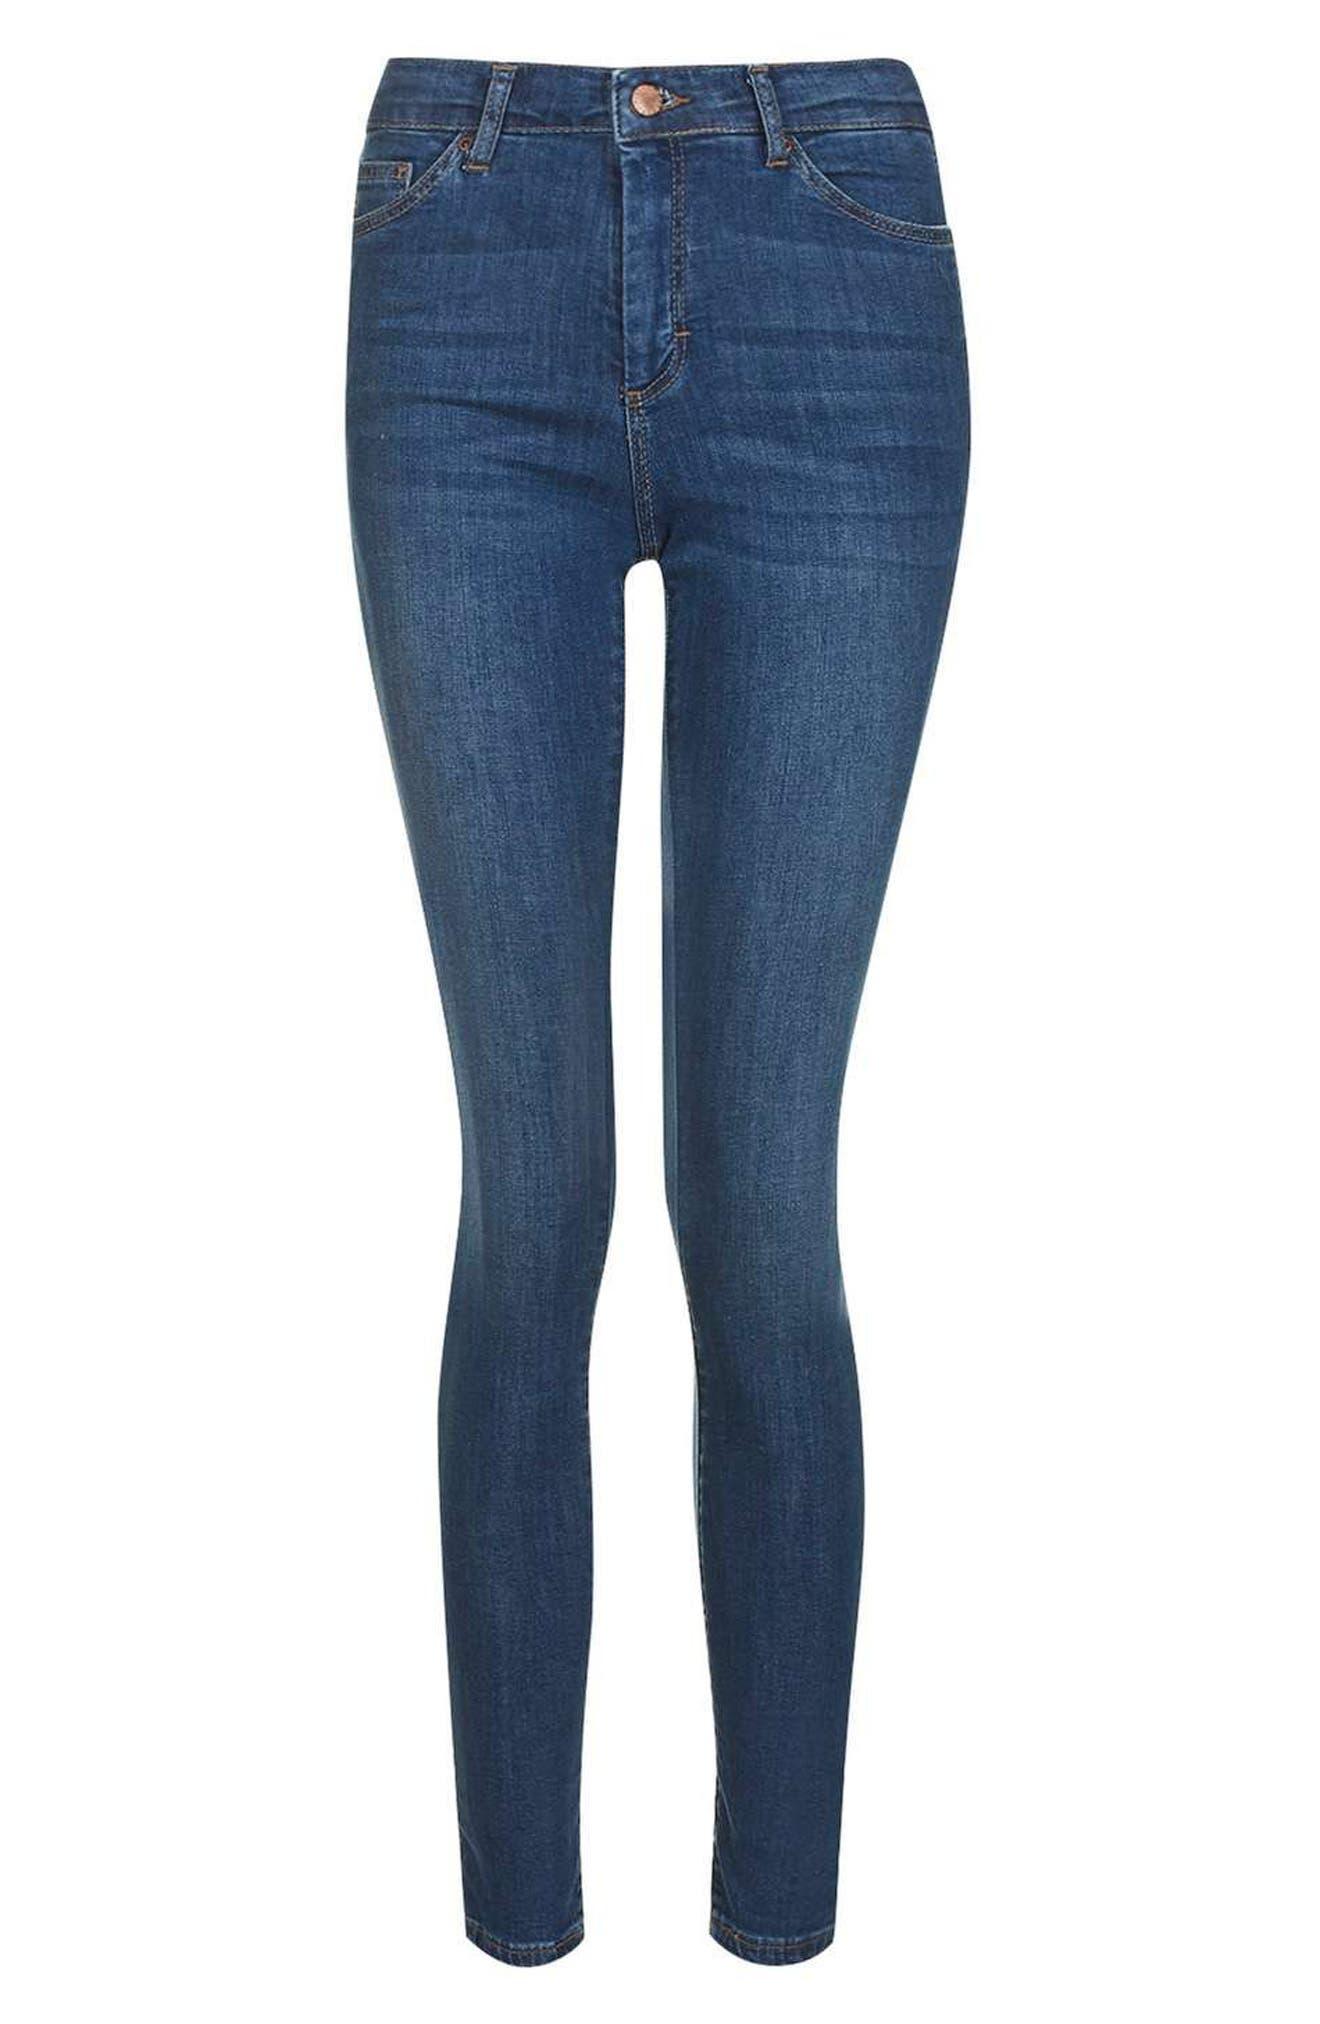 Leigh Skinny Jeans,                             Alternate thumbnail 5, color,                             Mid Denim